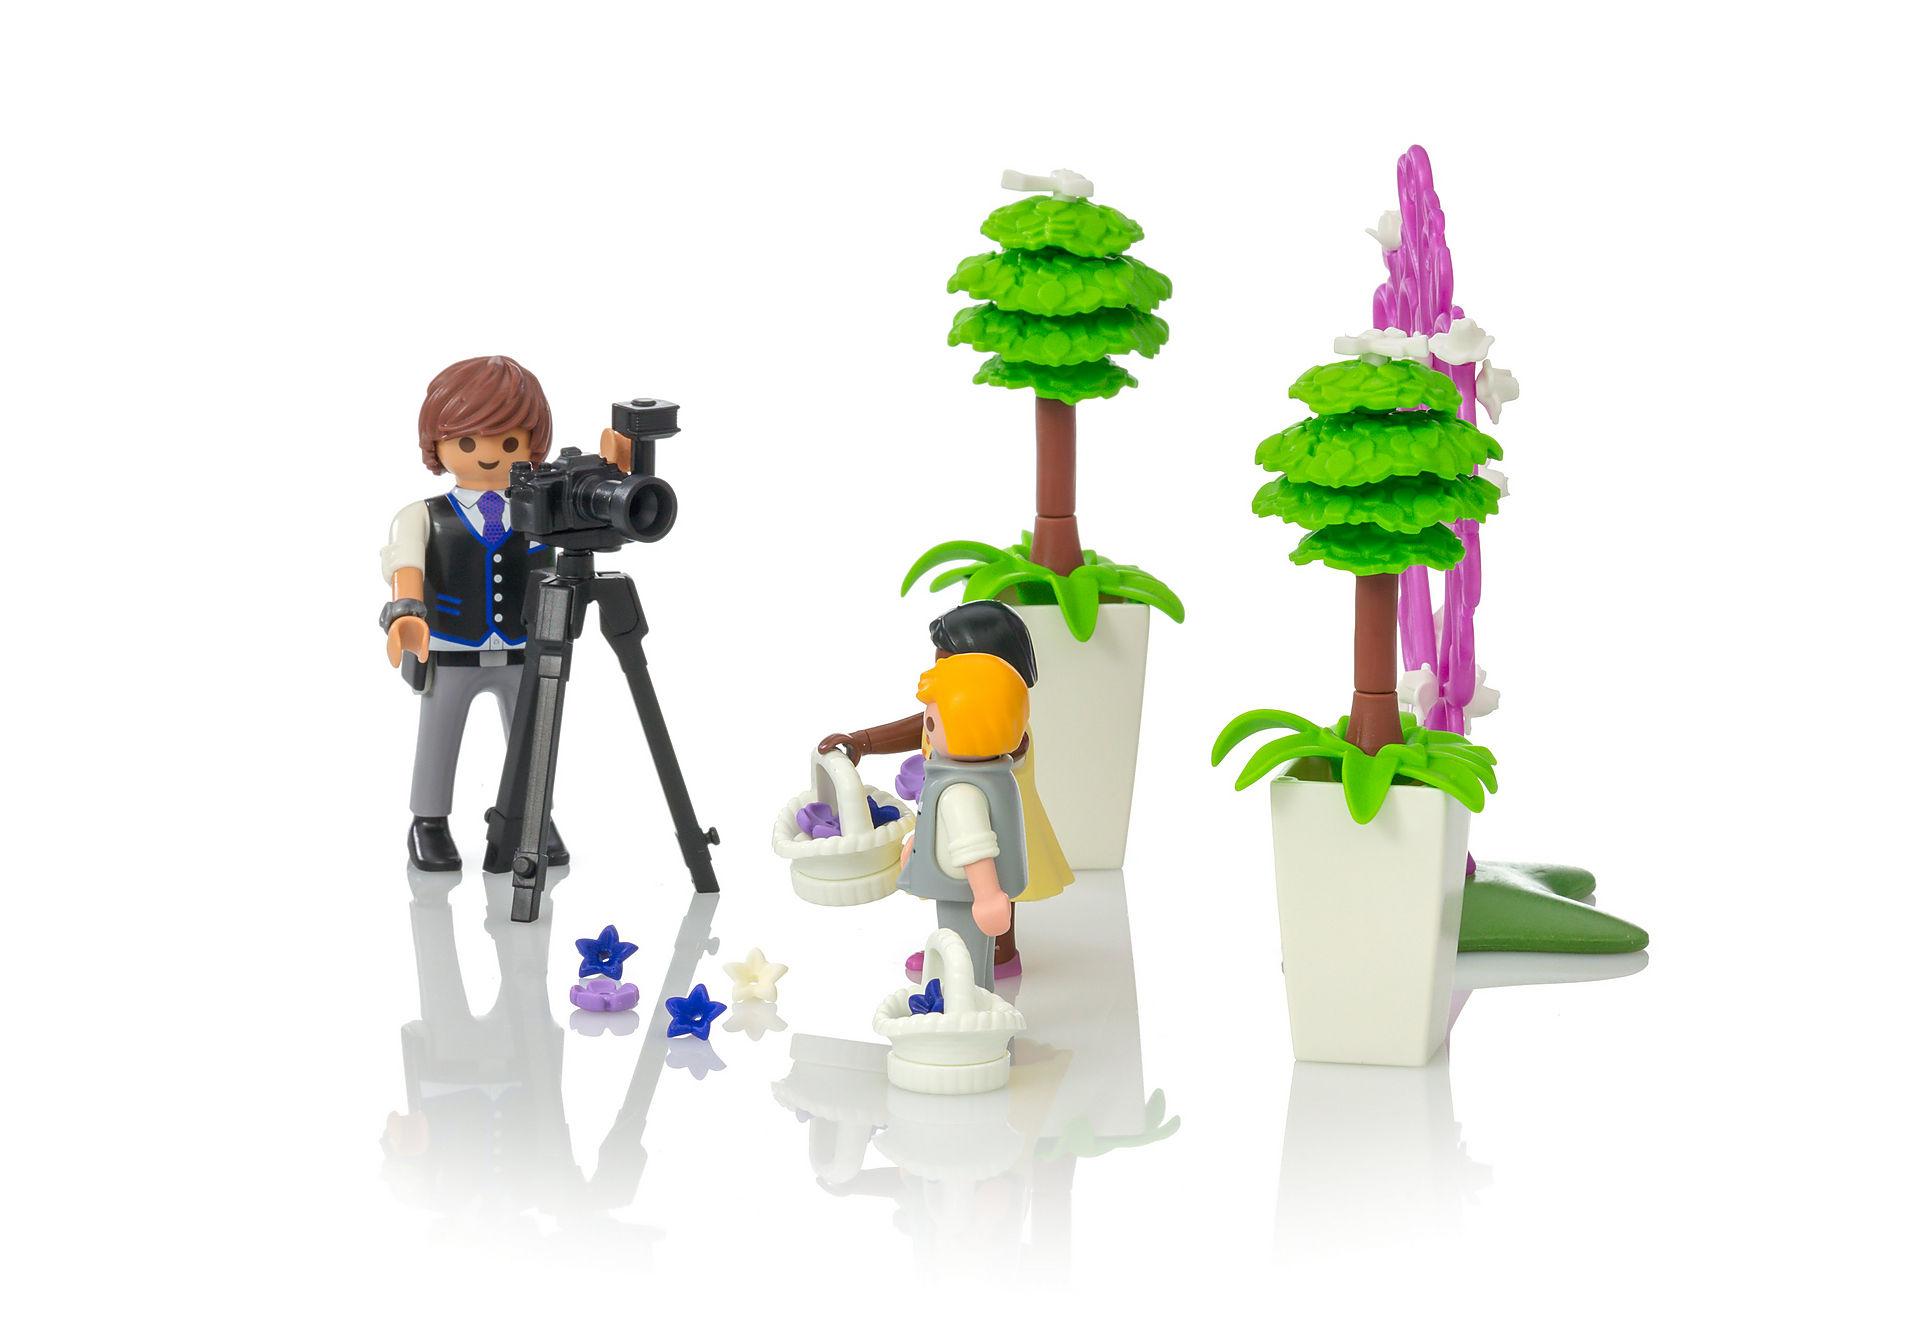 360degree image 5